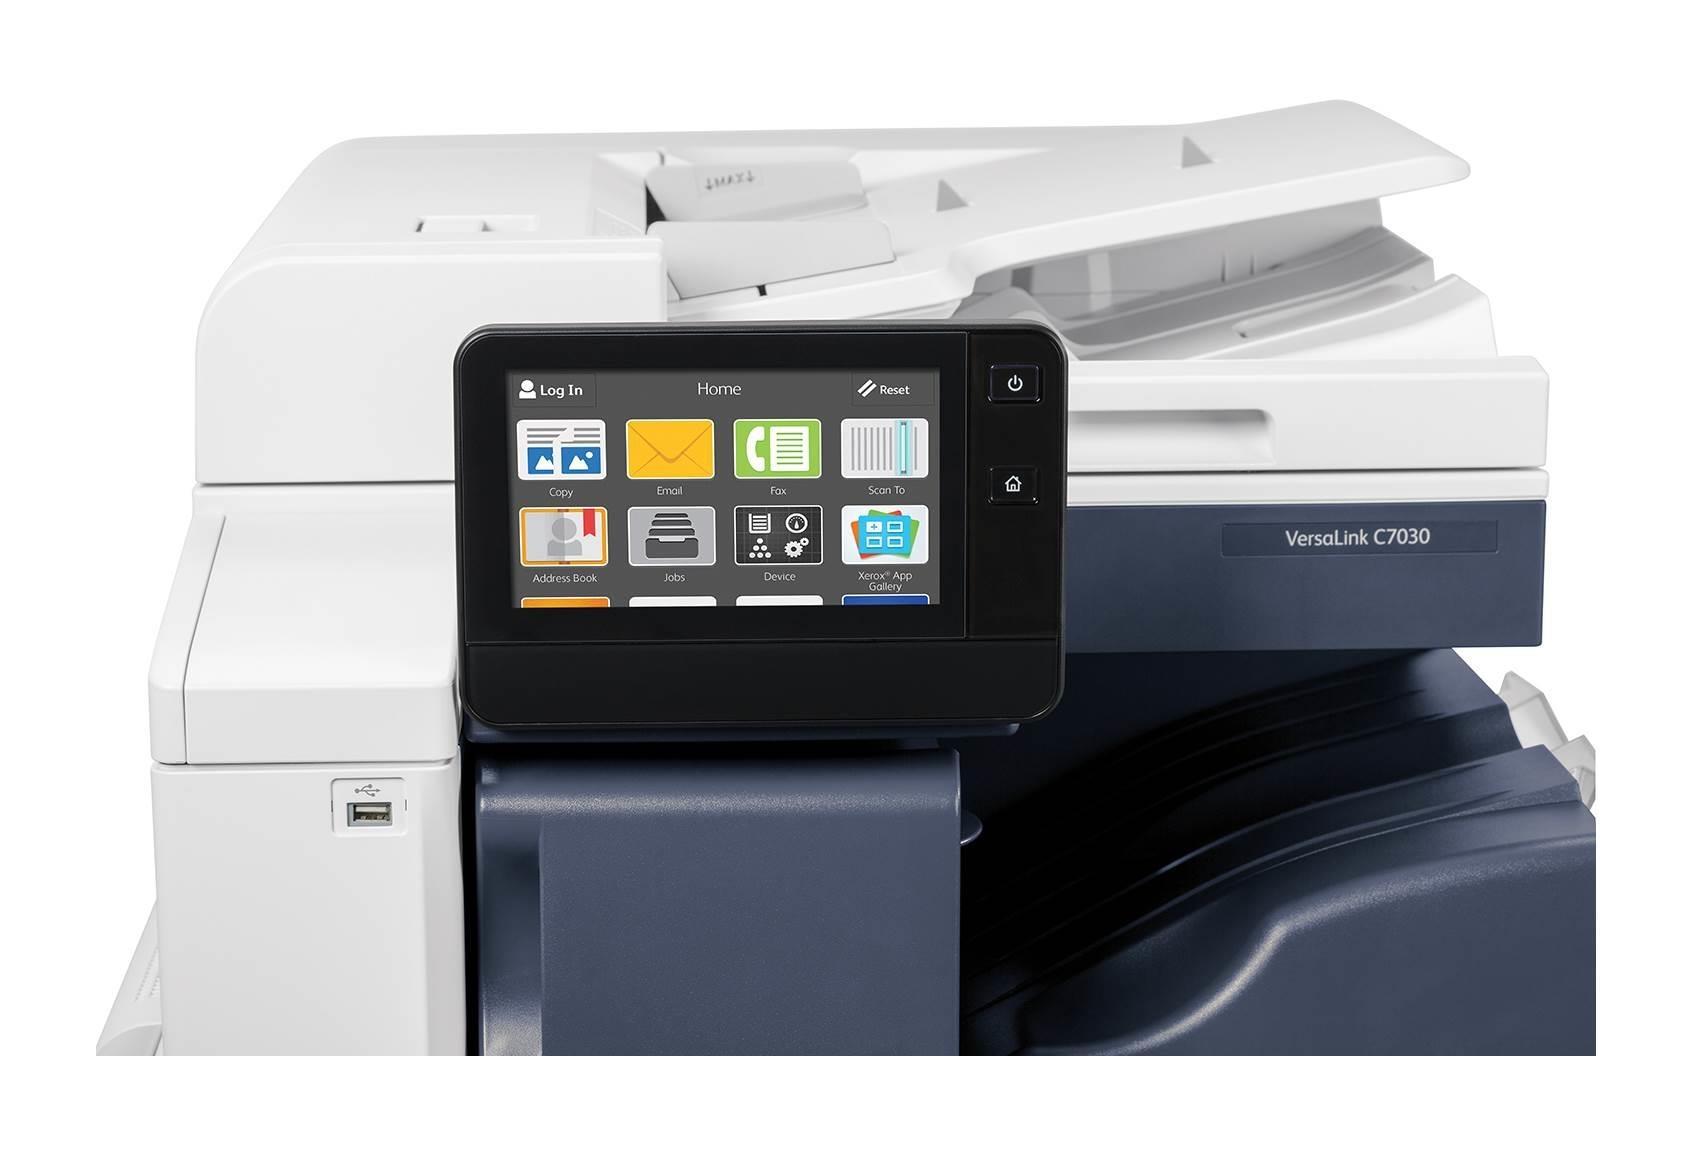 Xerox VersaLink C70xxV_S - COL MFZ,A3, NUTNÉ DOPLNIT O INICIALIZAČNÍ KIT; S=Stand (stand s 1 zásobníkem+HDD+Centre Tray)